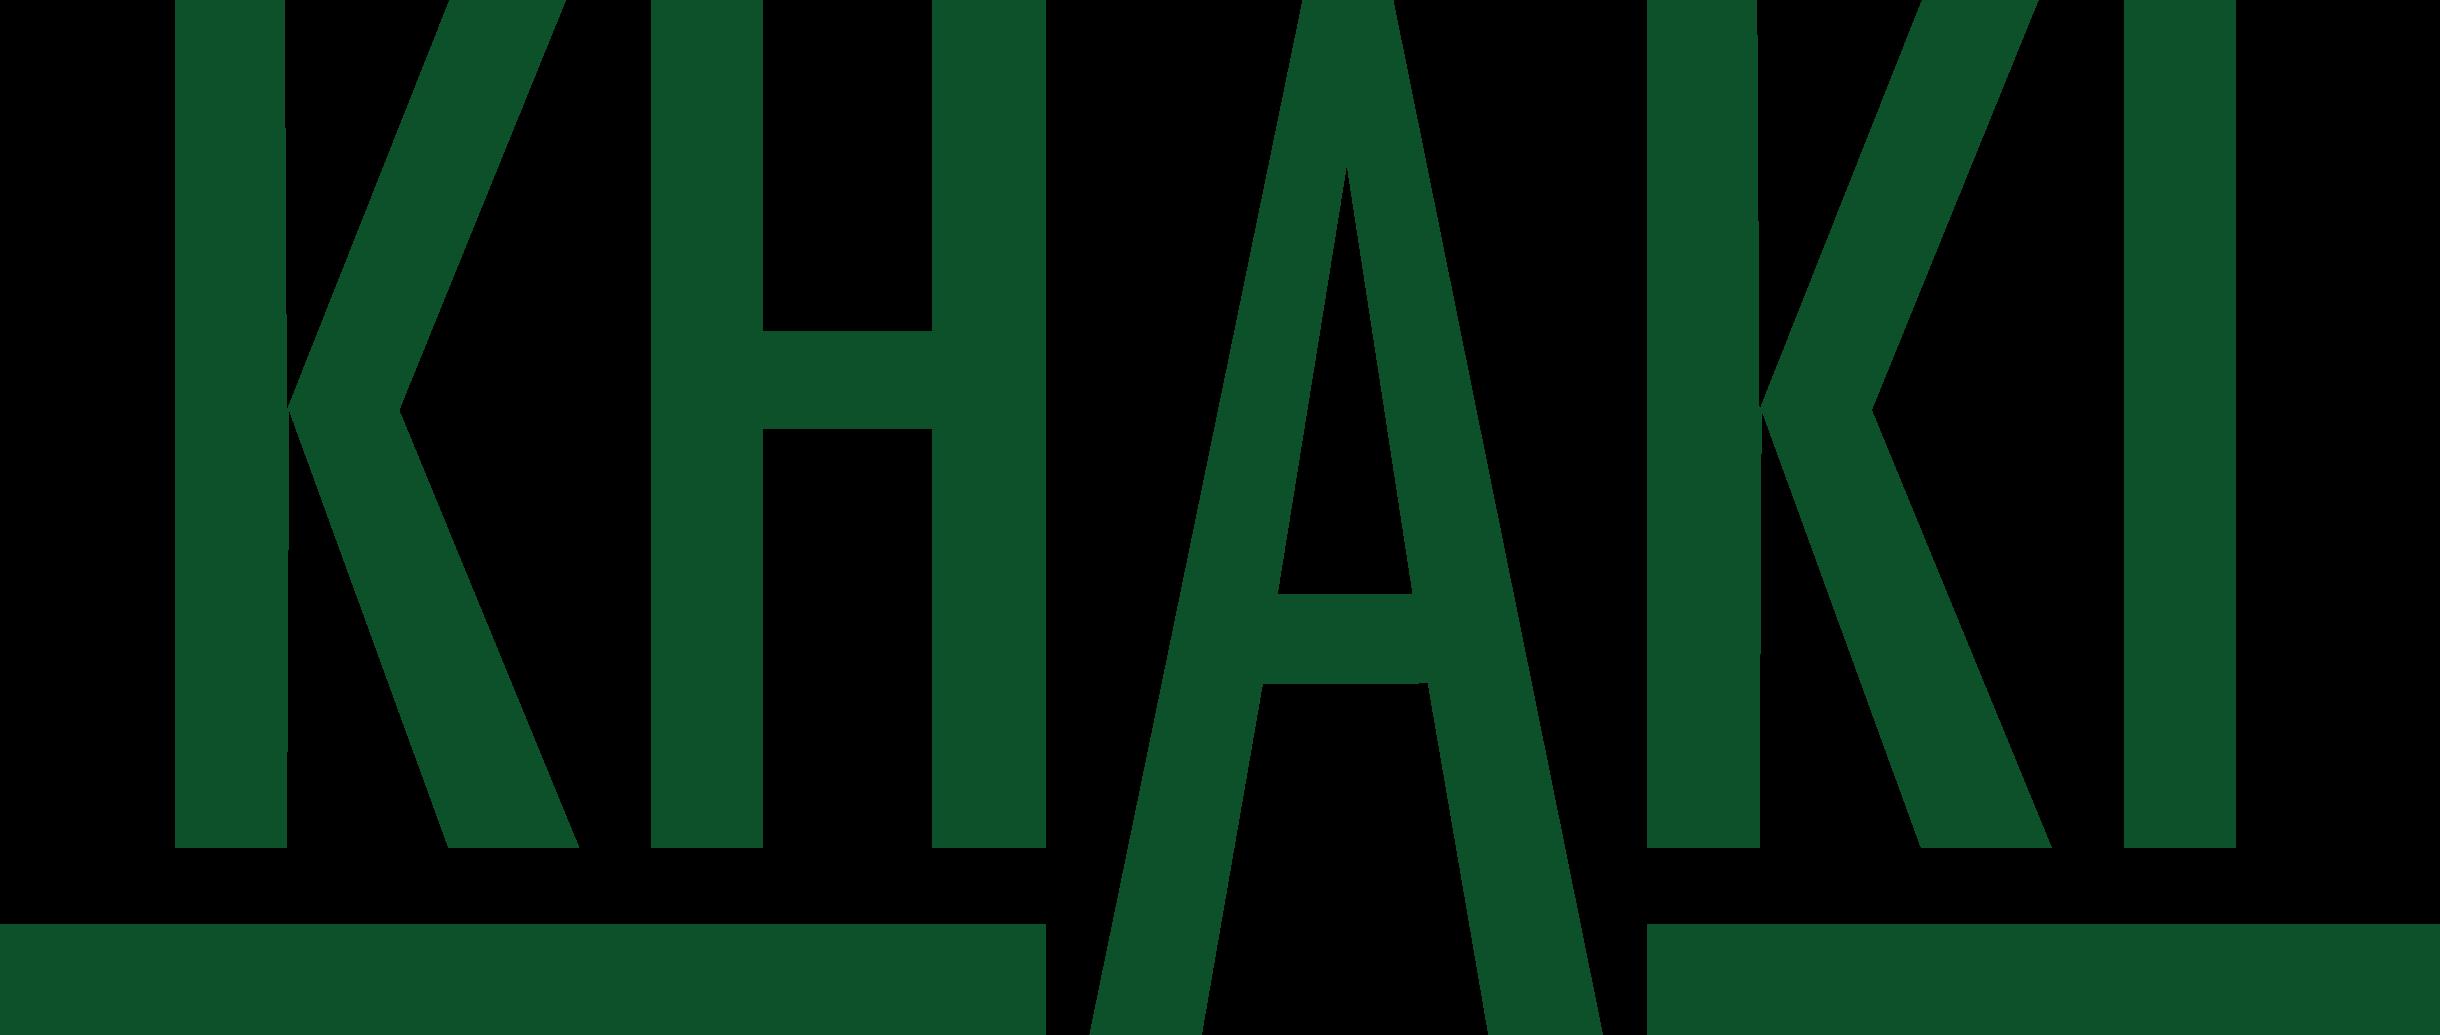 Khaki showroom logo